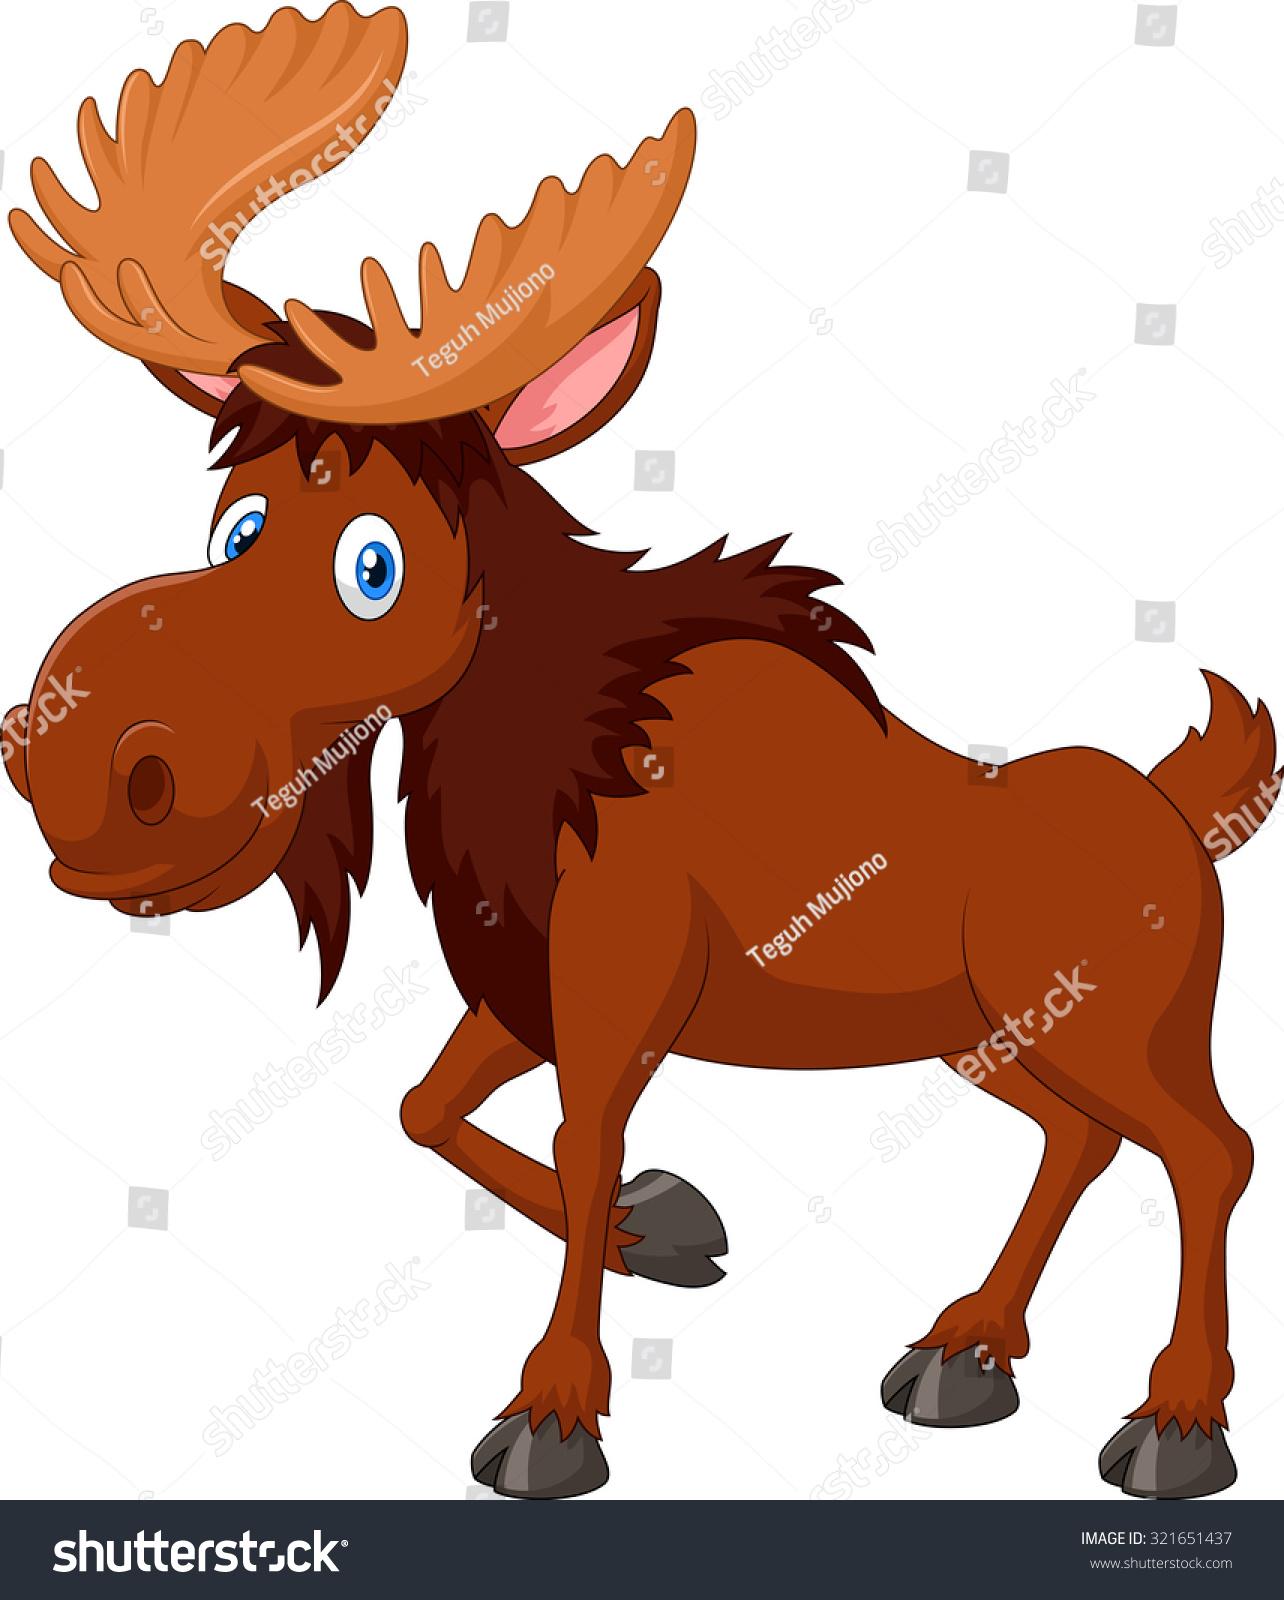 Moose face cartoon - photo#18